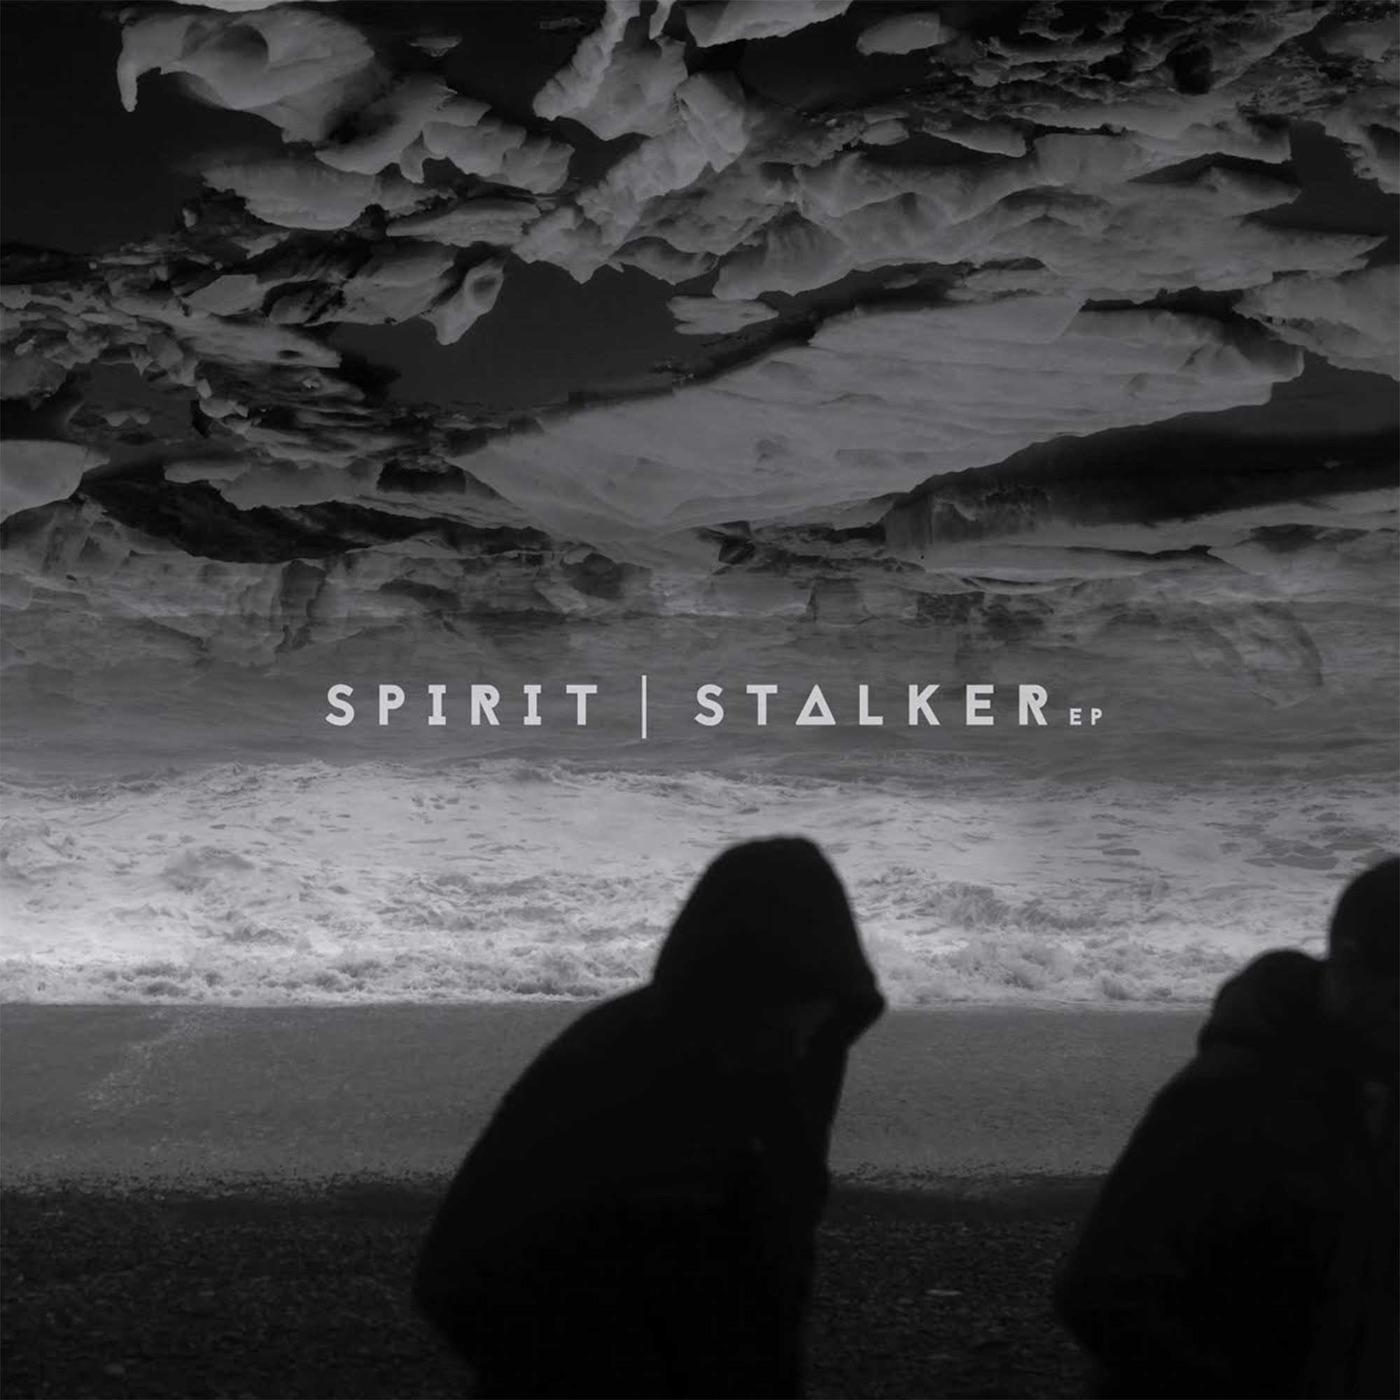 Stalker - Single